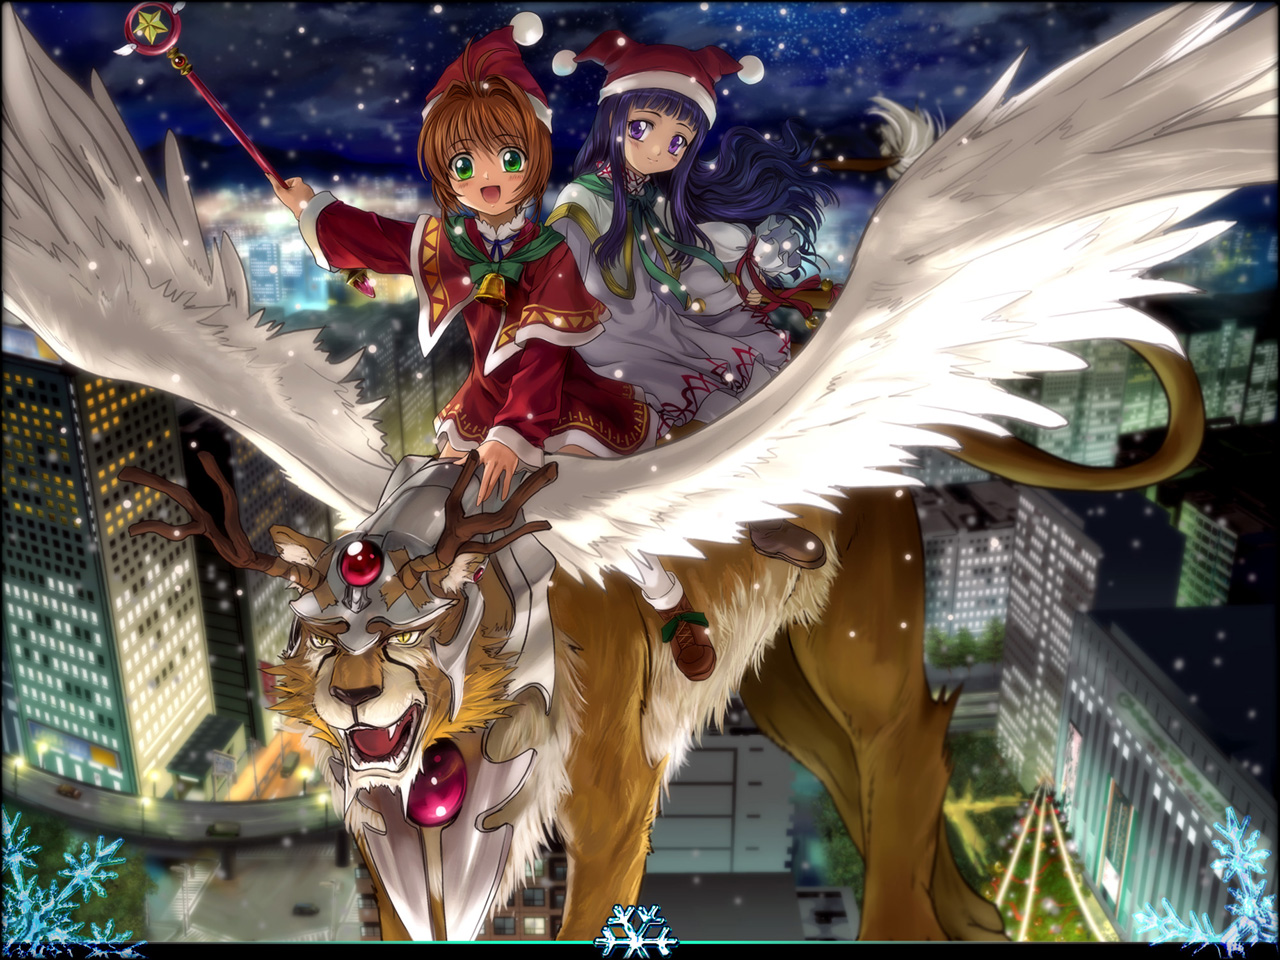 card_captor_sakura christmas daidouji_tomoyo kerberos kero kinomoto_sakura moonknives